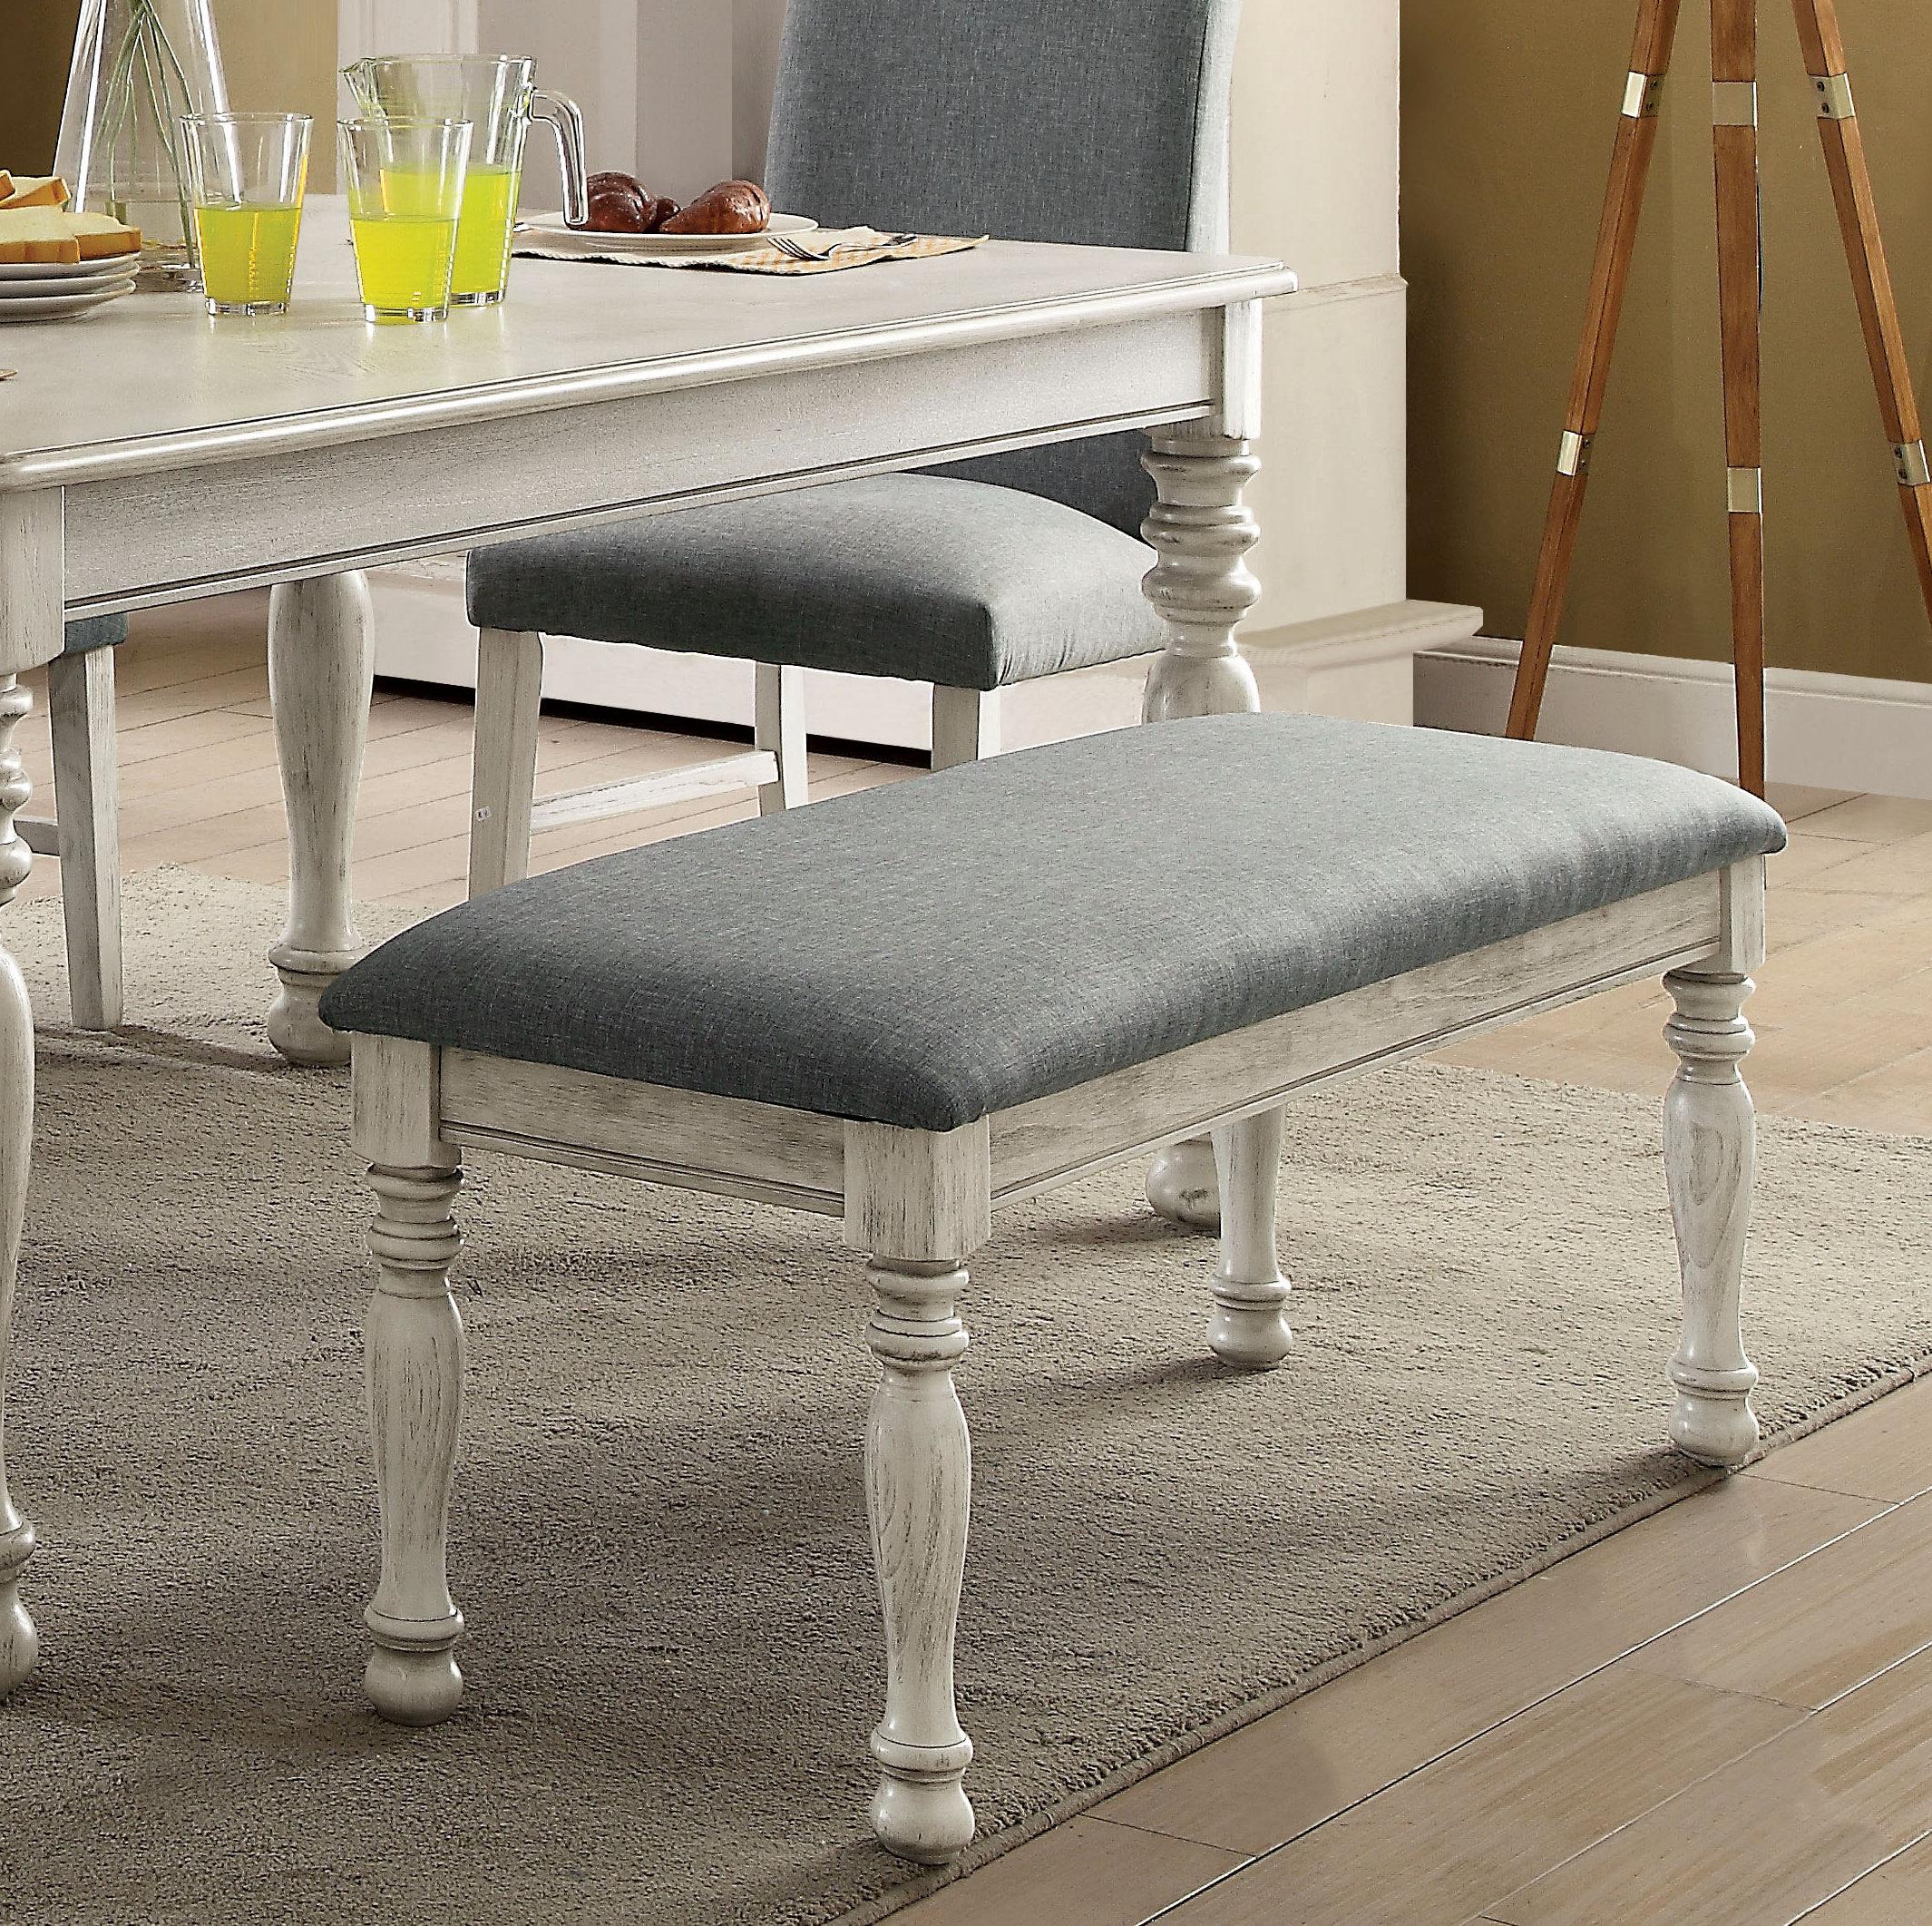 Ophelia Co Kanisha Upholstered Bench Reviews Wayfair